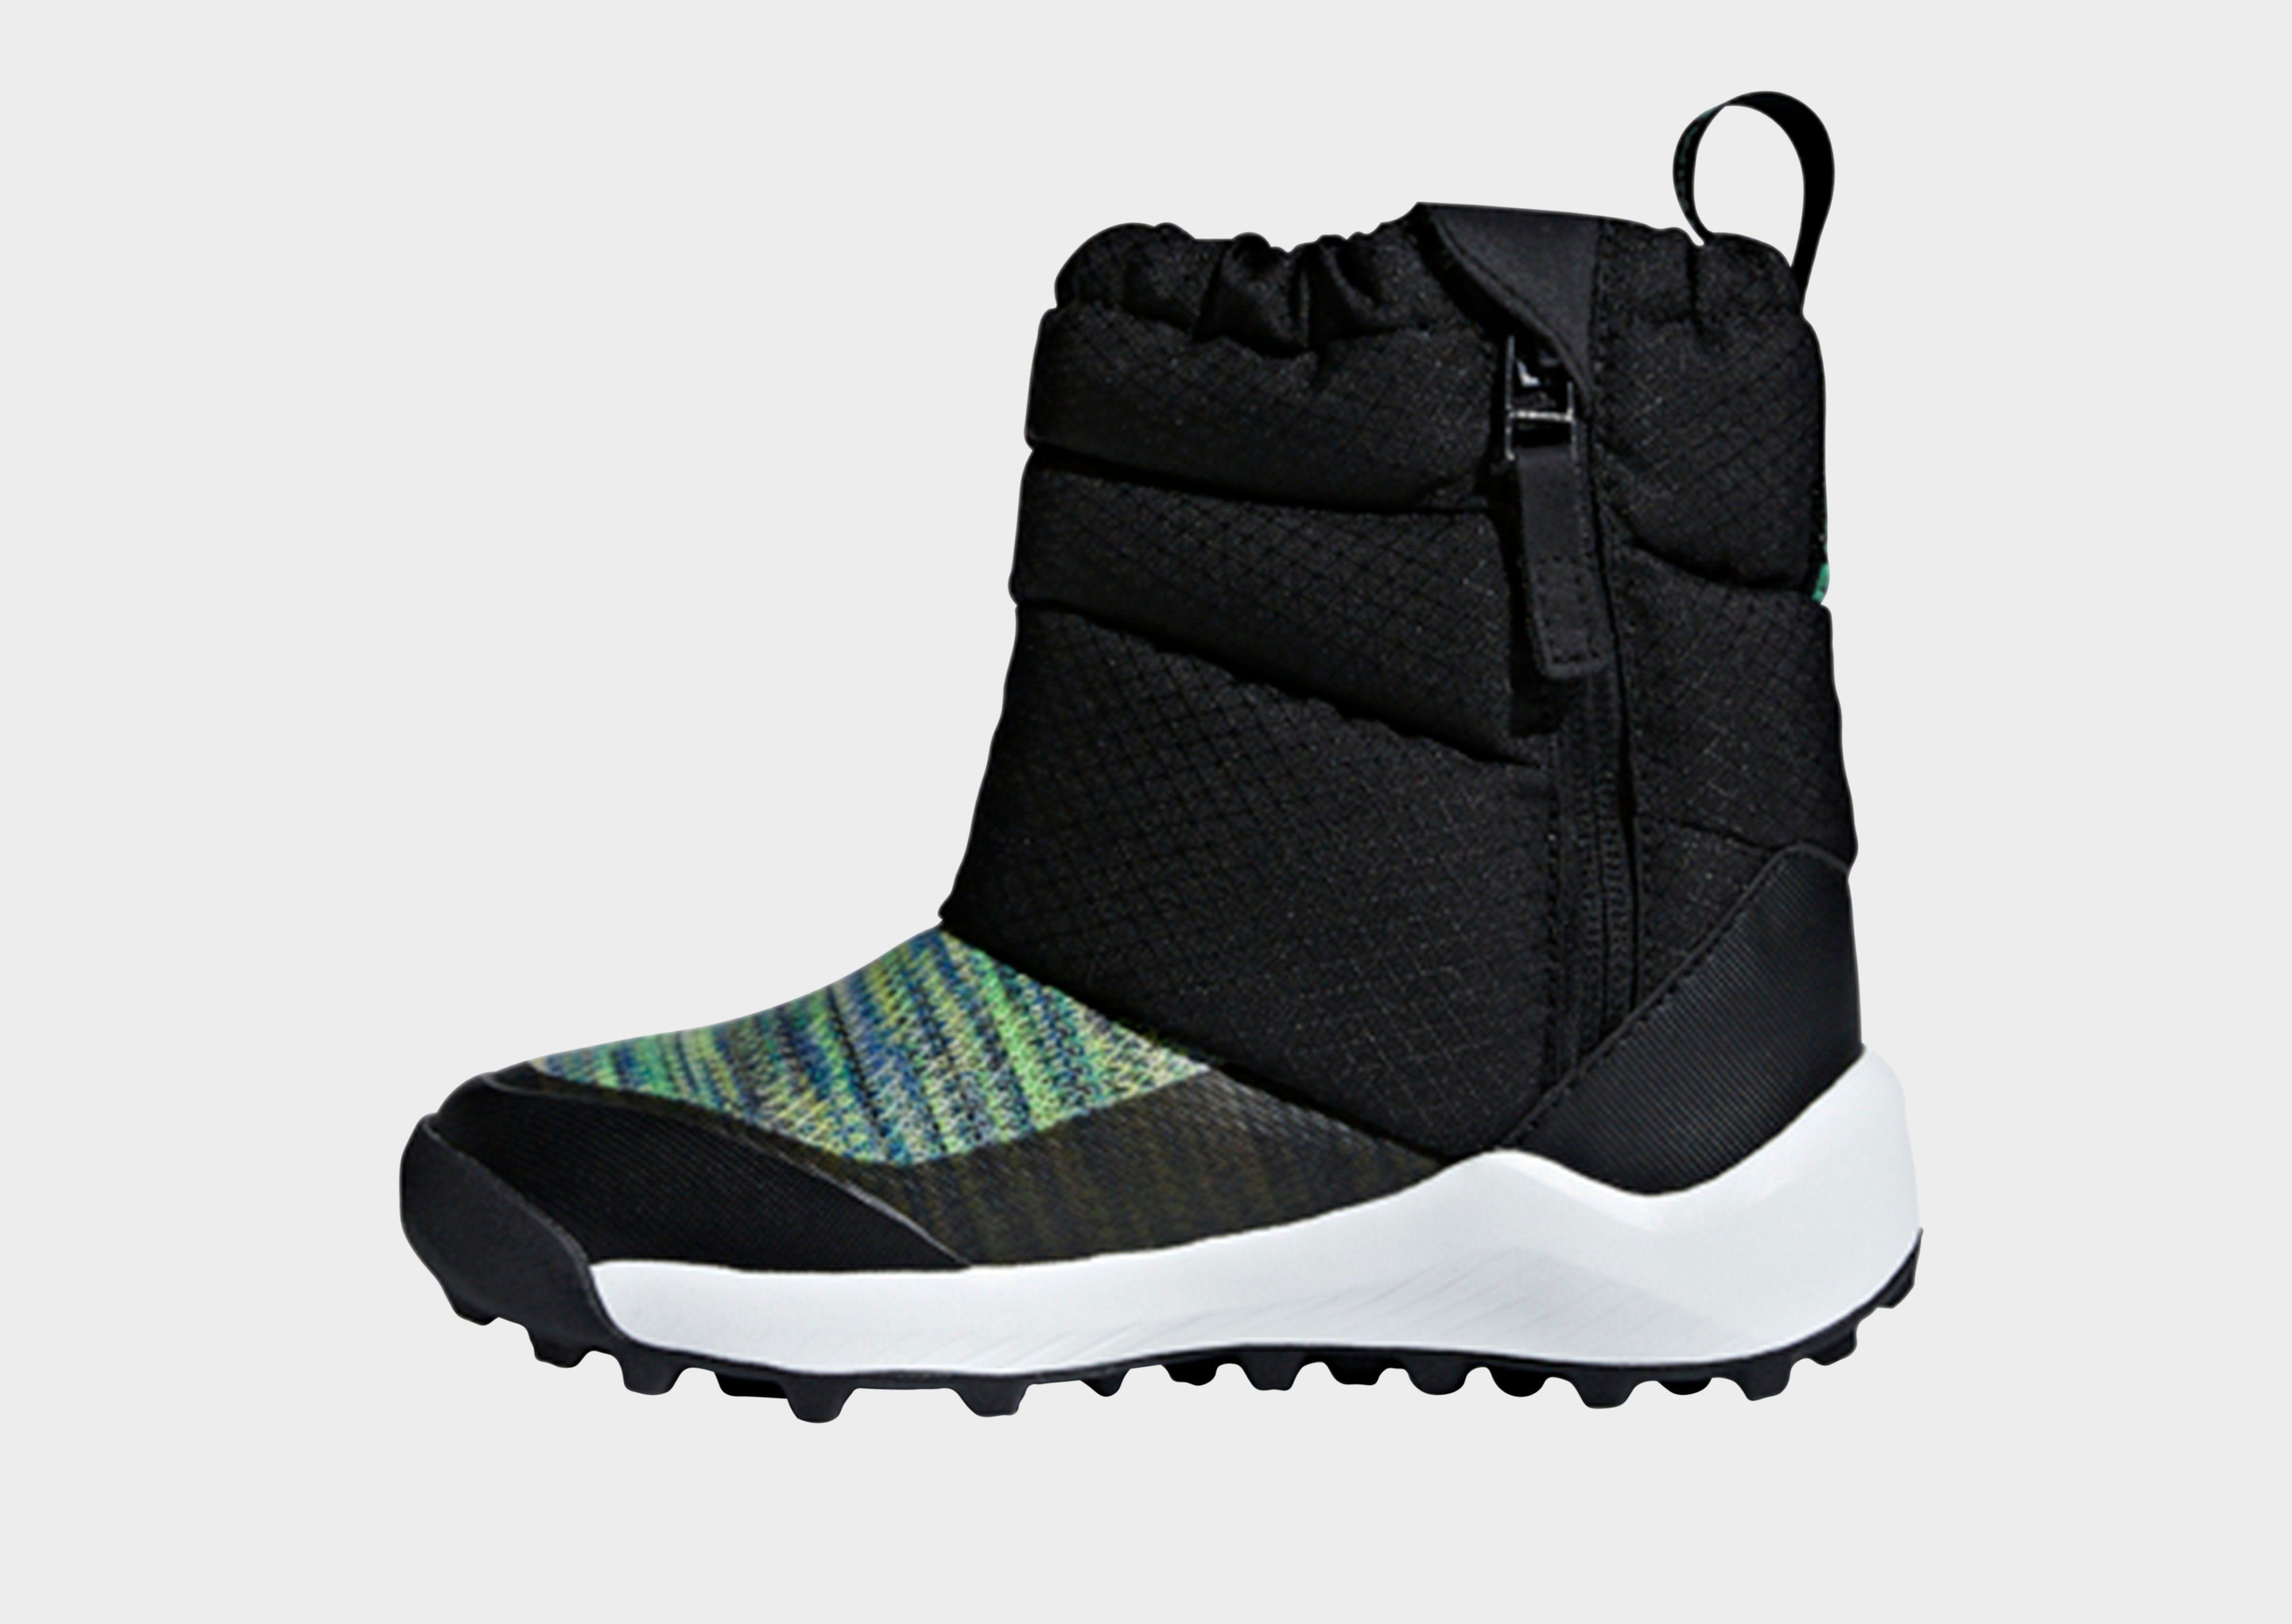 c5f76cee1bc ADIDAS RapidaSnow Beat the Winter Boots | JD Sports